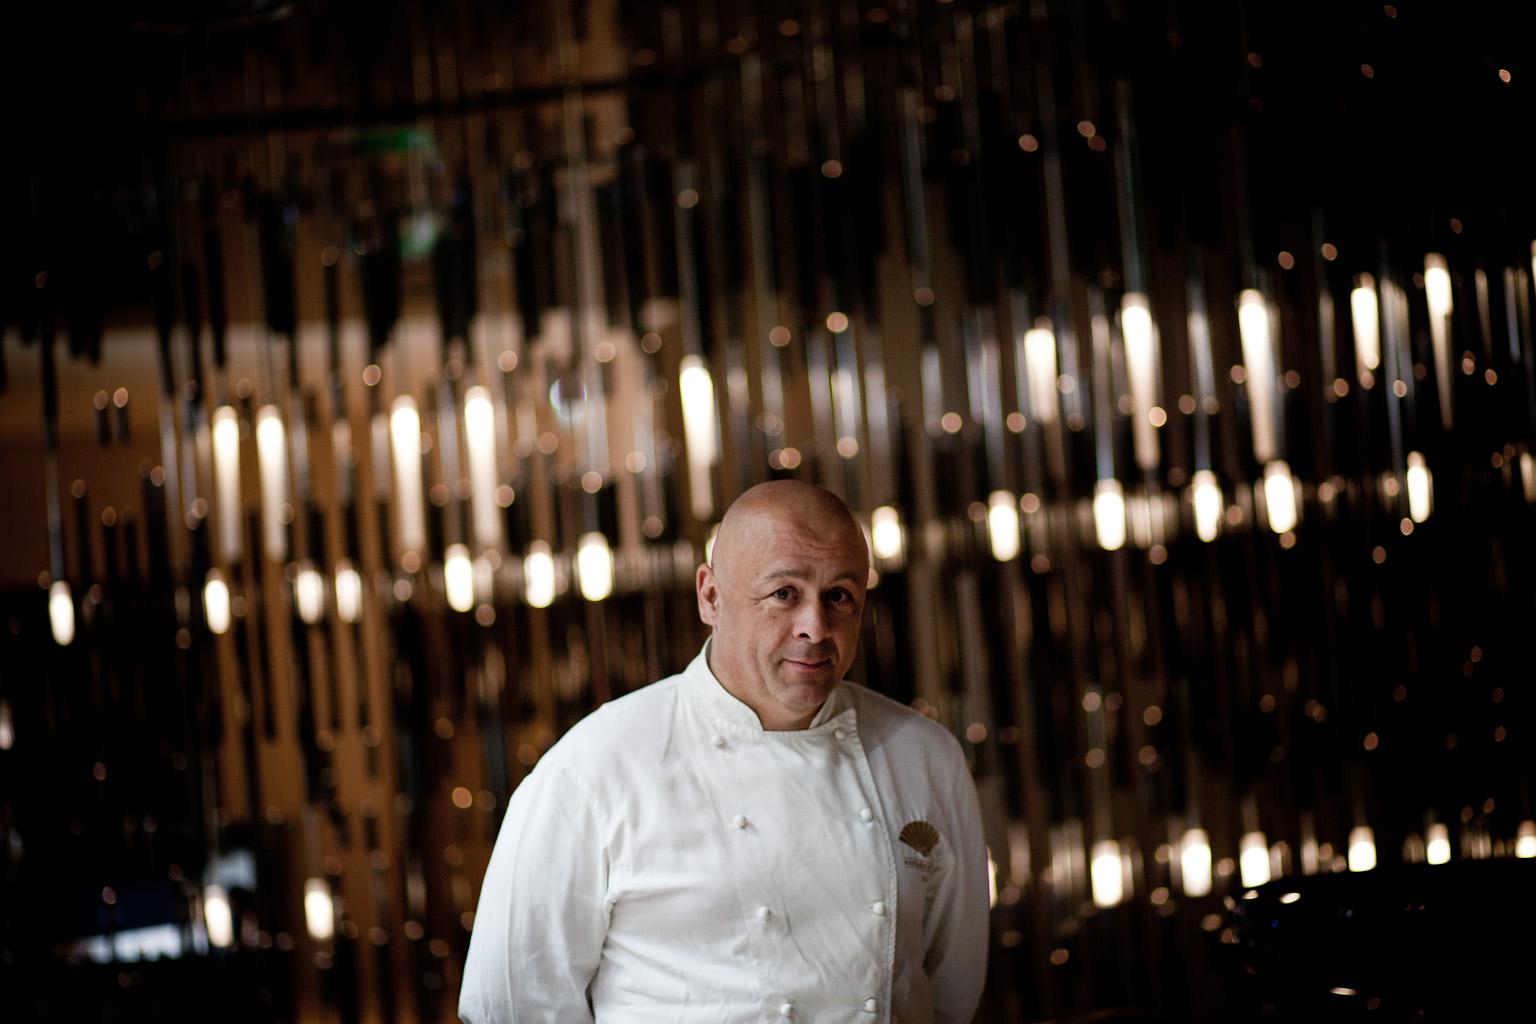 Thierry marx son manifeste du voyage a r magazine for Cuisinier marx